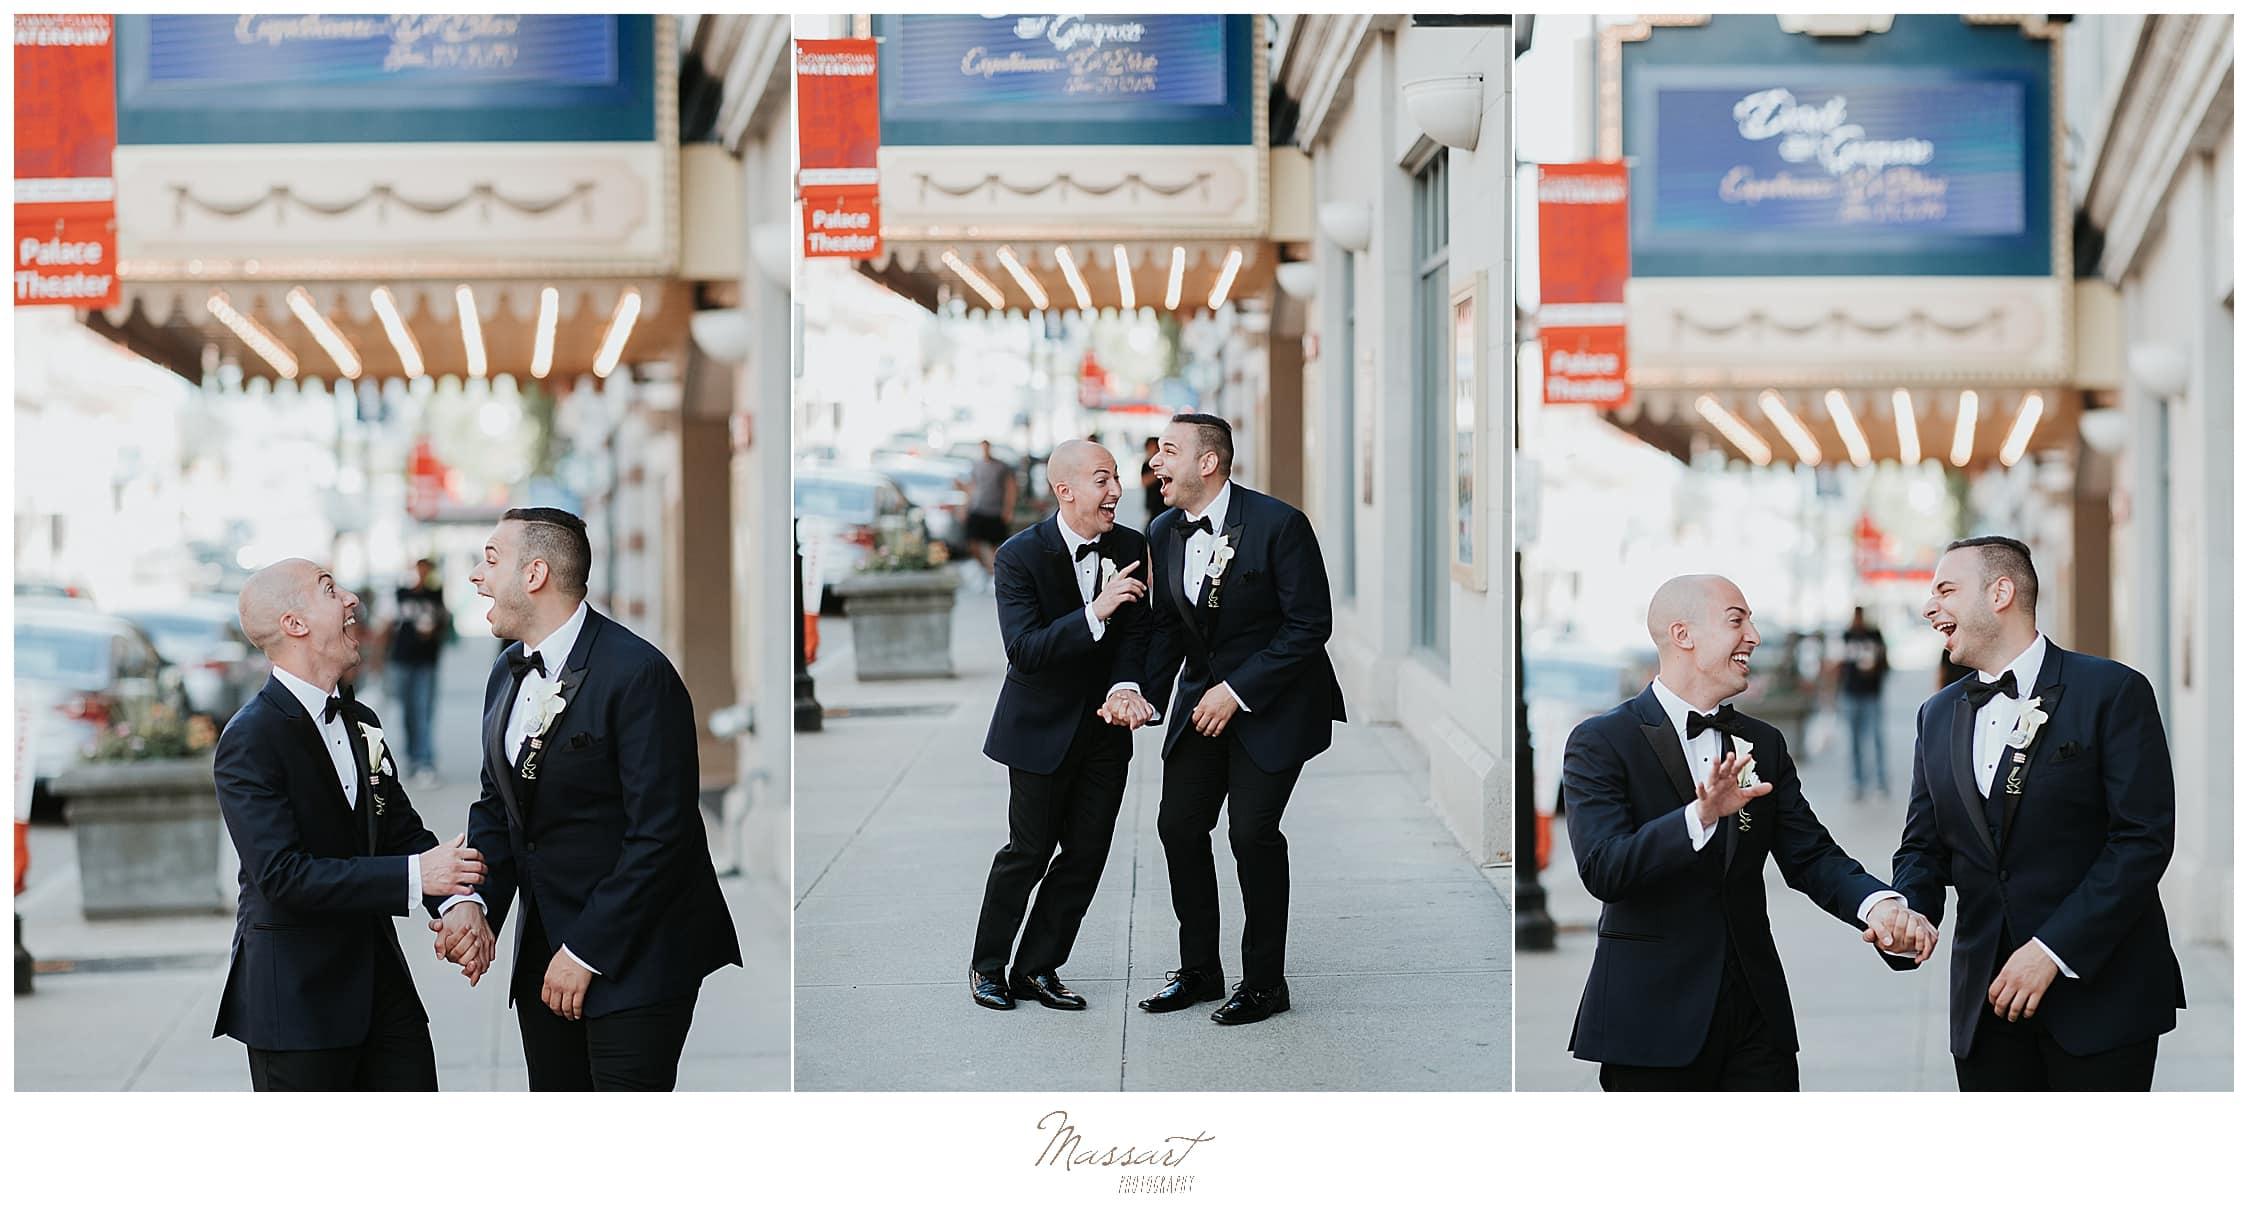 joyful wedding portraits near Palace Theater in Waterbury CT by wedding photographers Massart Photography